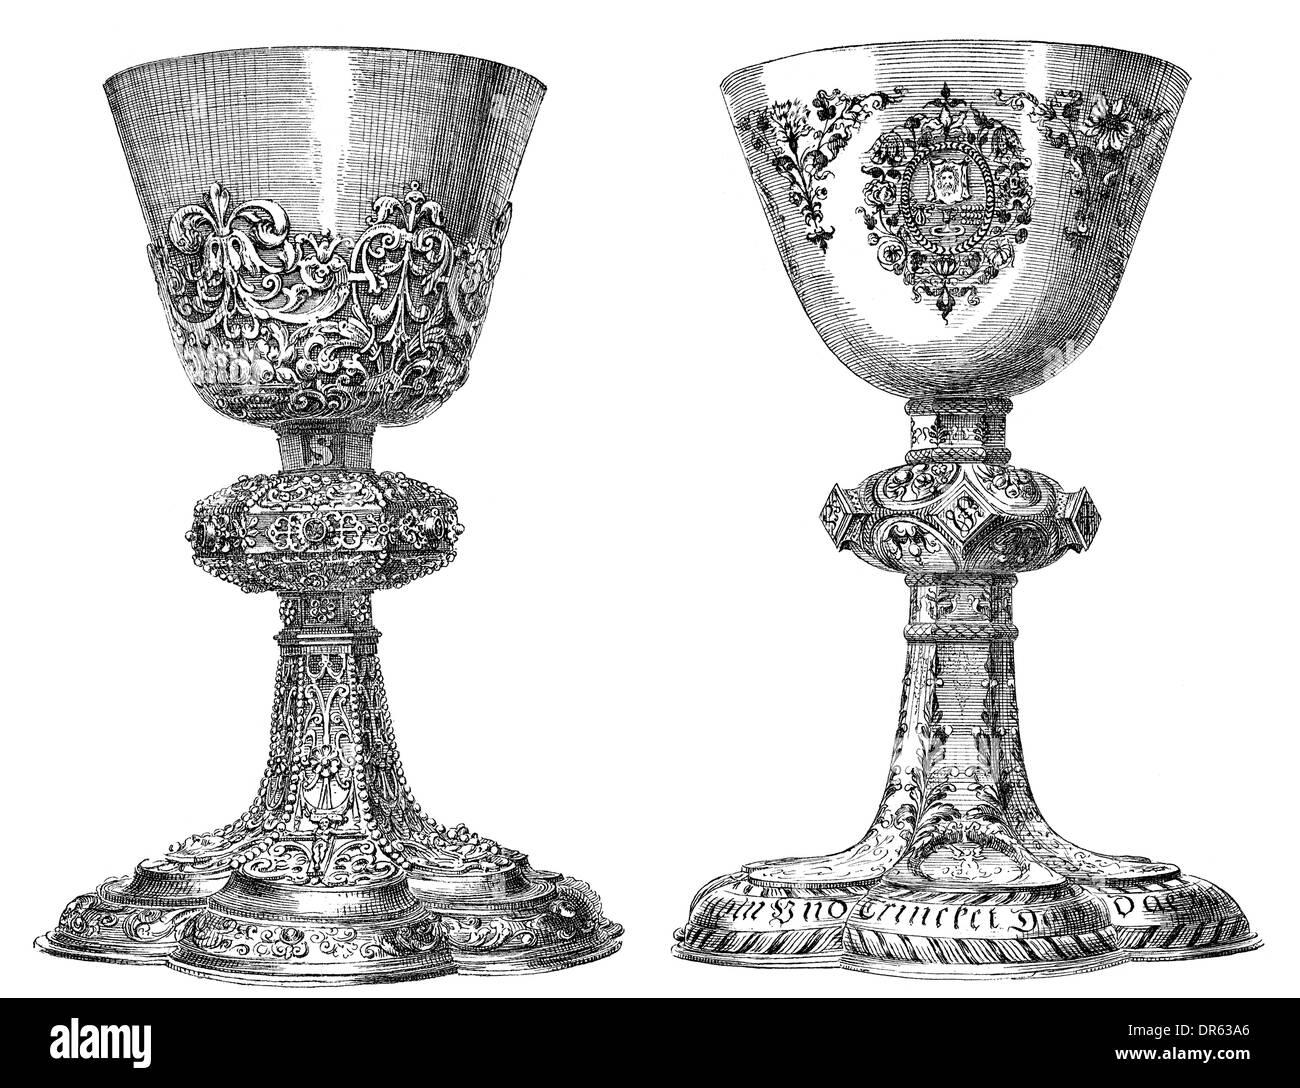 German Renaissance style, 16th century, religious chalices - Stock Image